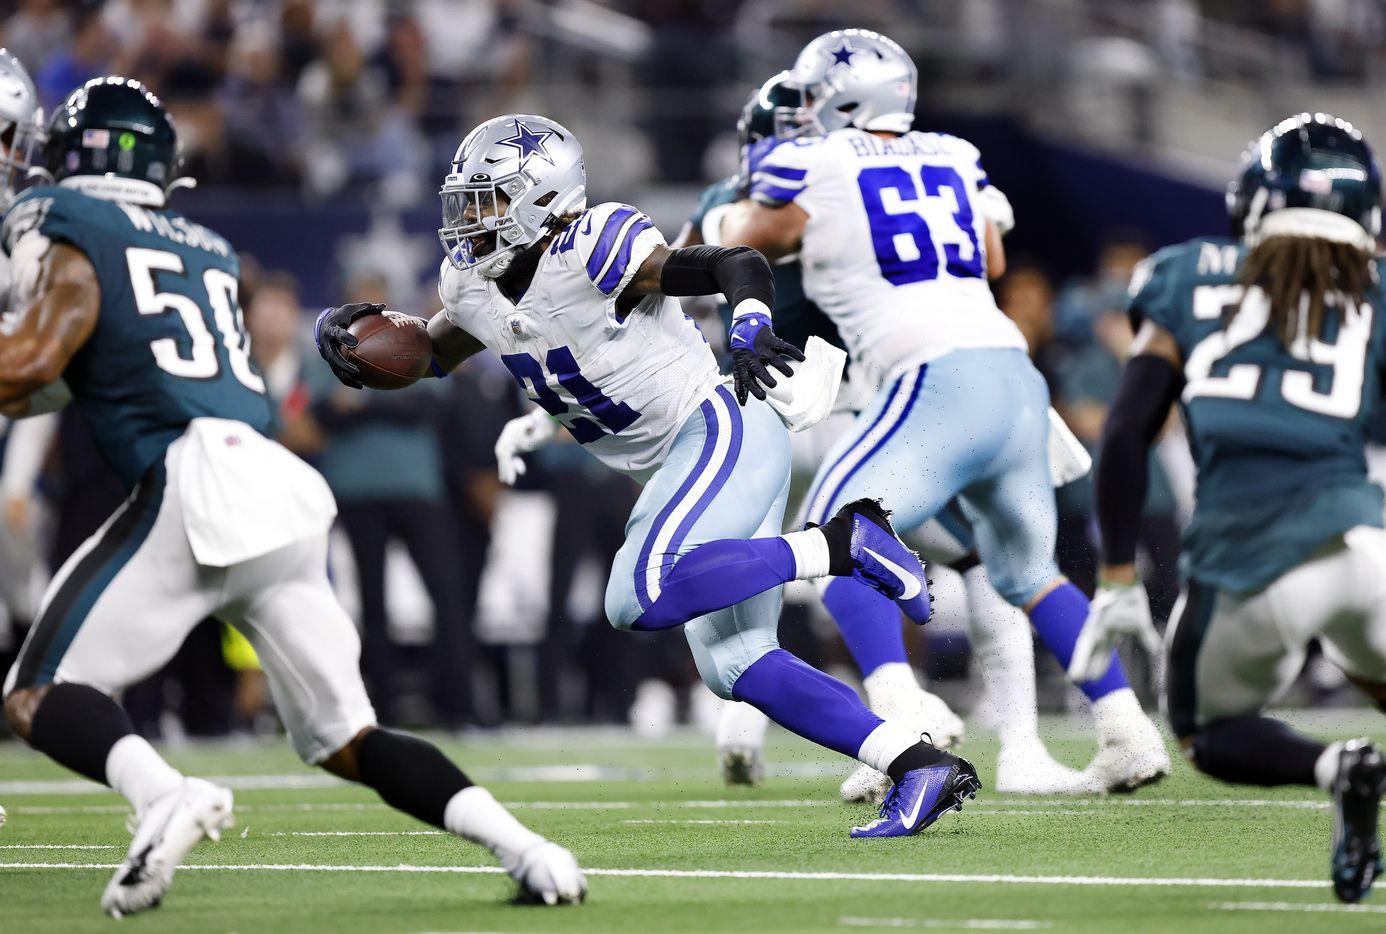 Dallas Cowboys running back Ezekiel Elliott (21) breaks away for a big run against the Philadelphia Eagles defense during the second quarter at AT&T Stadium in Arlington, Monday, September 27, 2021. (Tom Fox/The Dallas Morning News)